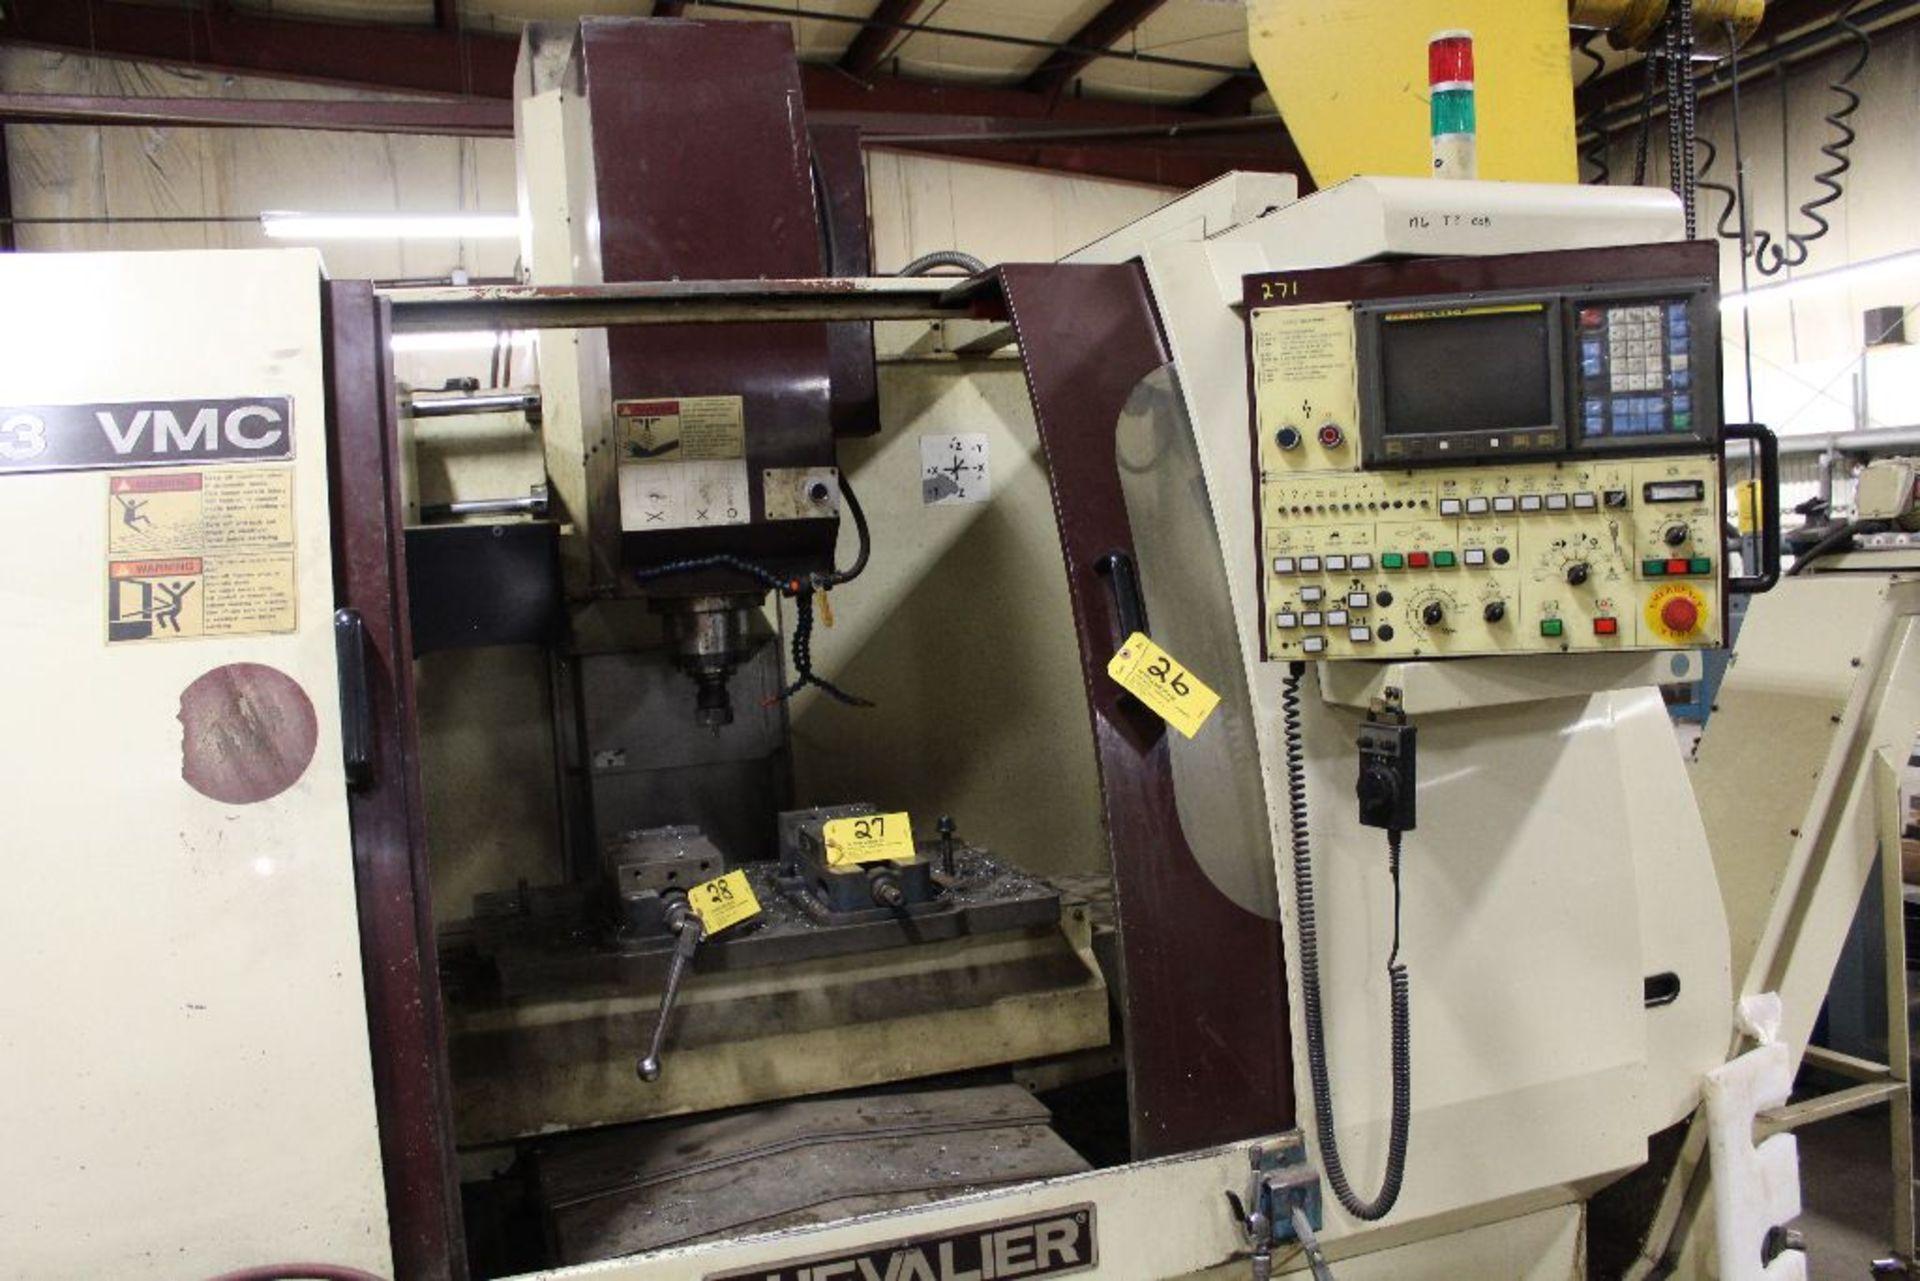 Lot 026 - Chevalier model 2033 Vertical Machining Center, sn MC875A09, 6 axis, 20 tool changer.